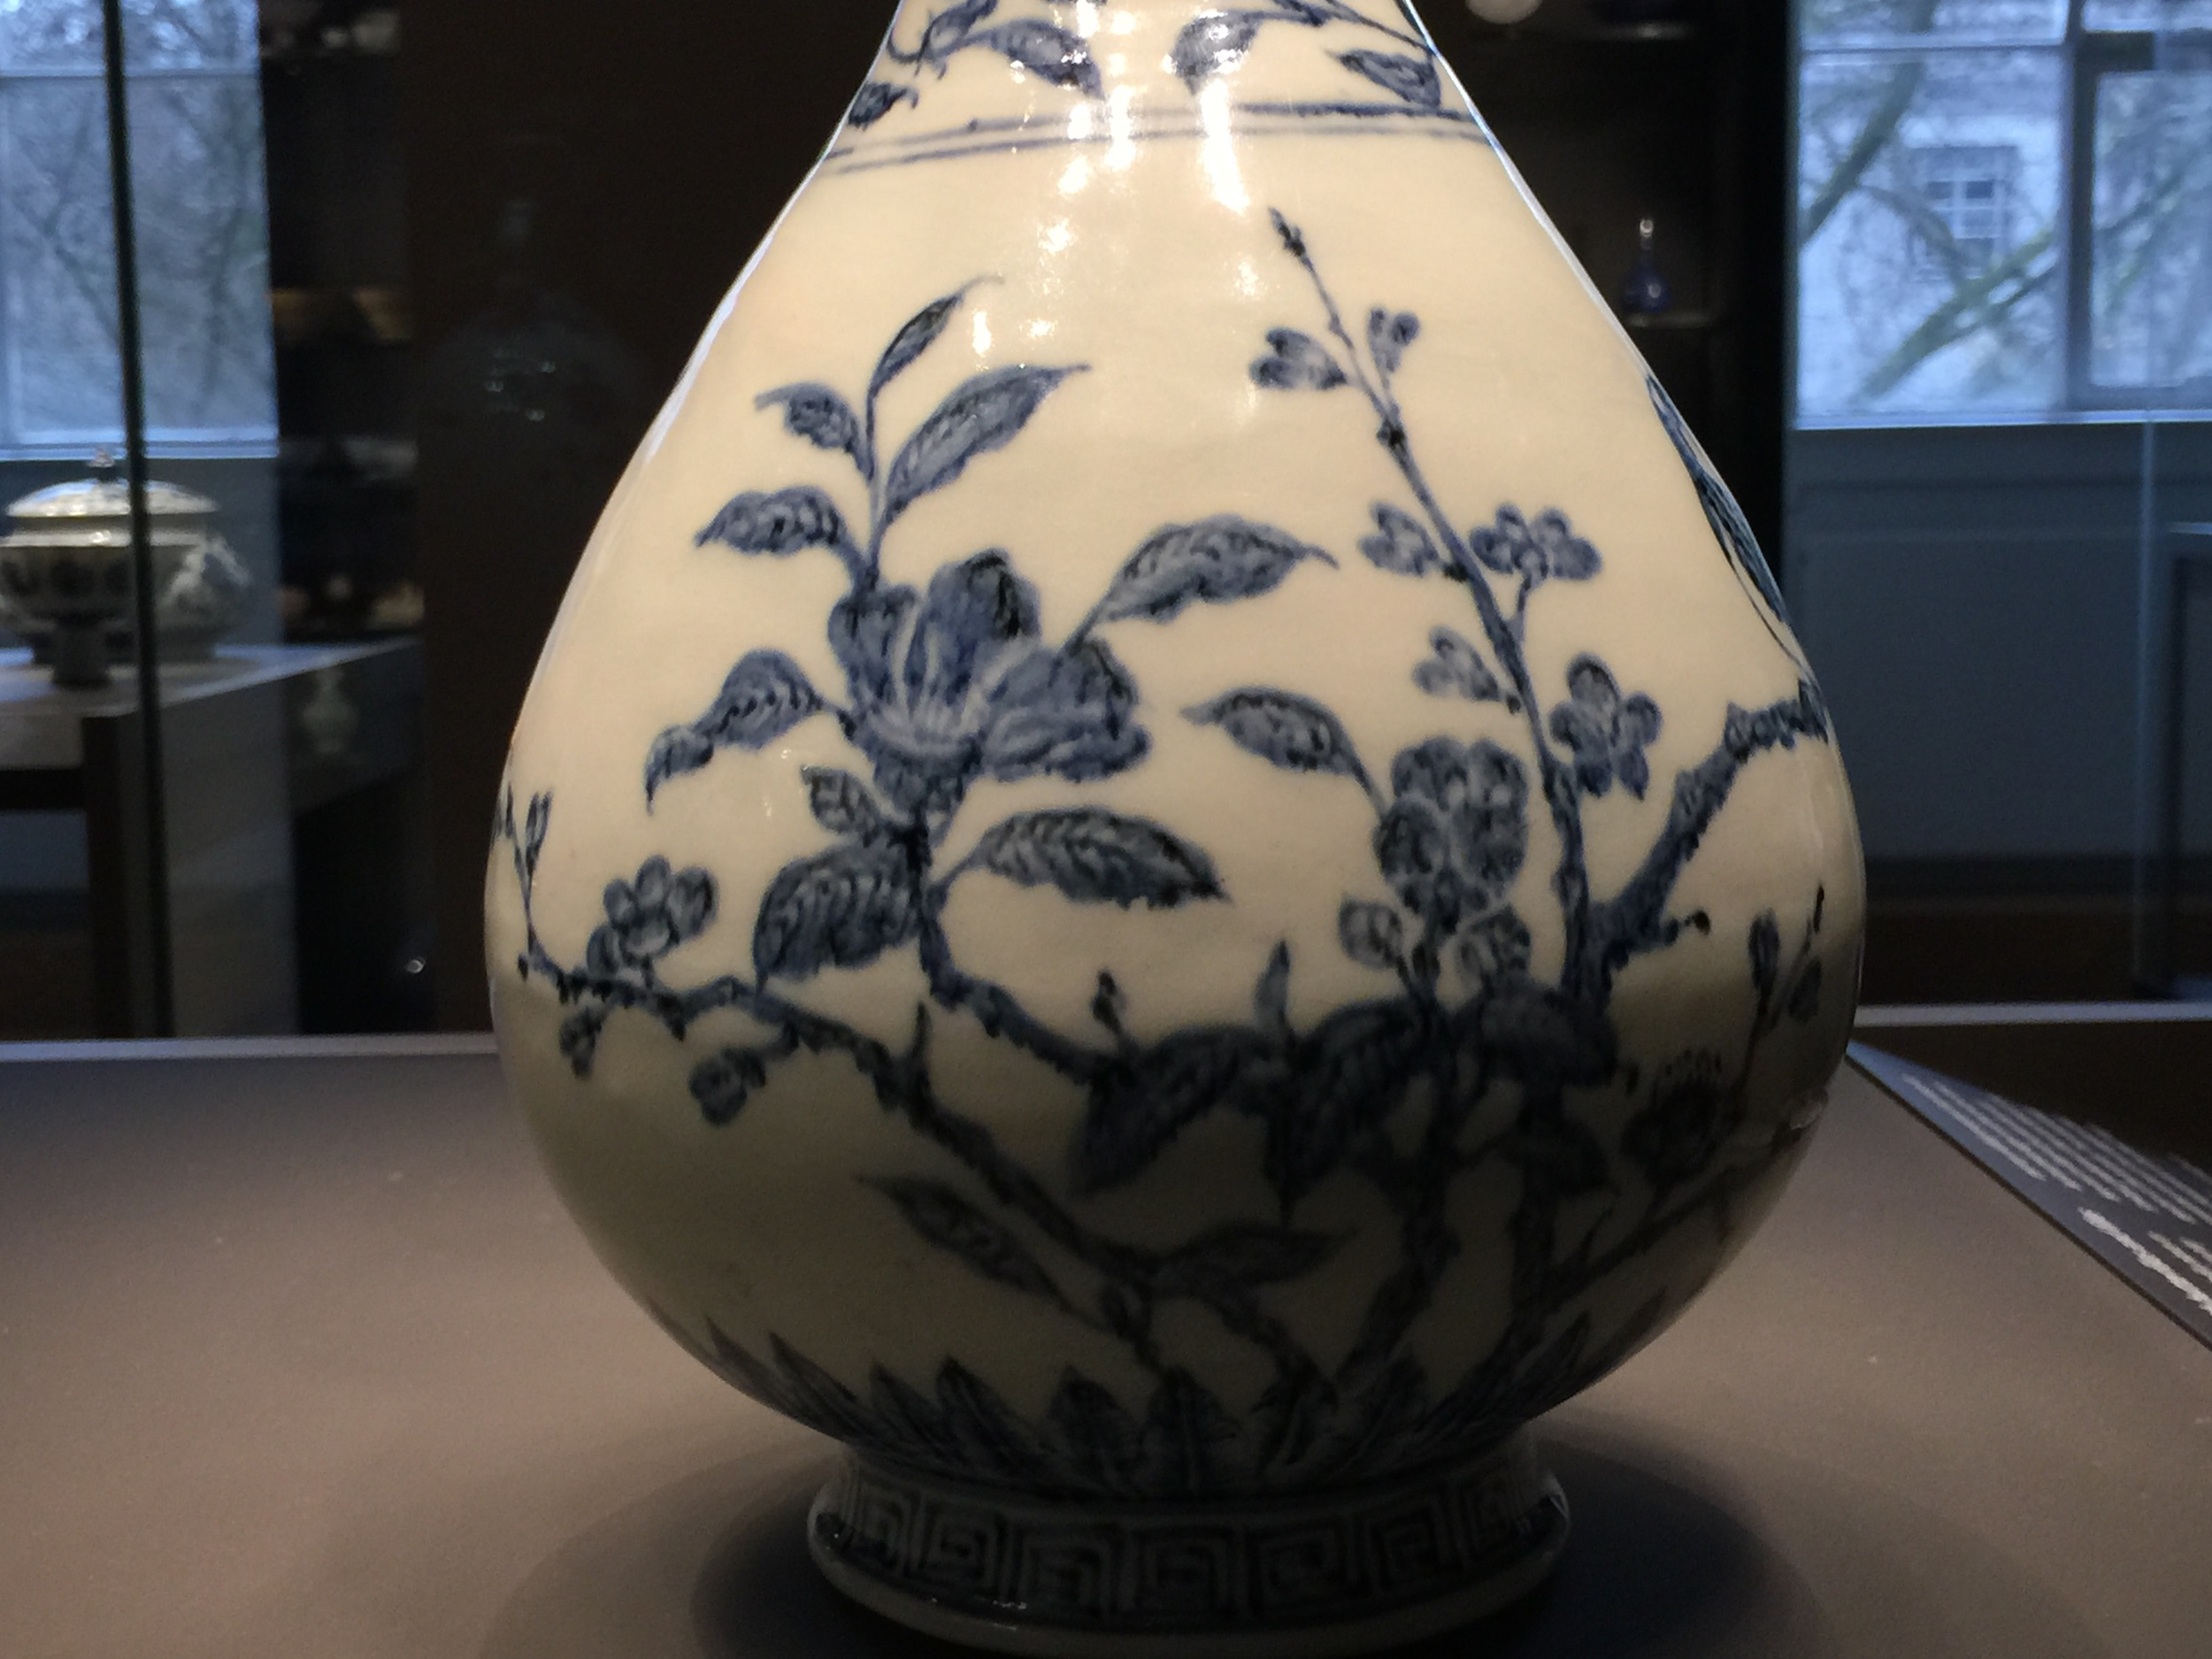 Chinese-Porcelain-British-Museum-Percival-David-jessewaugh.com-45.jpg